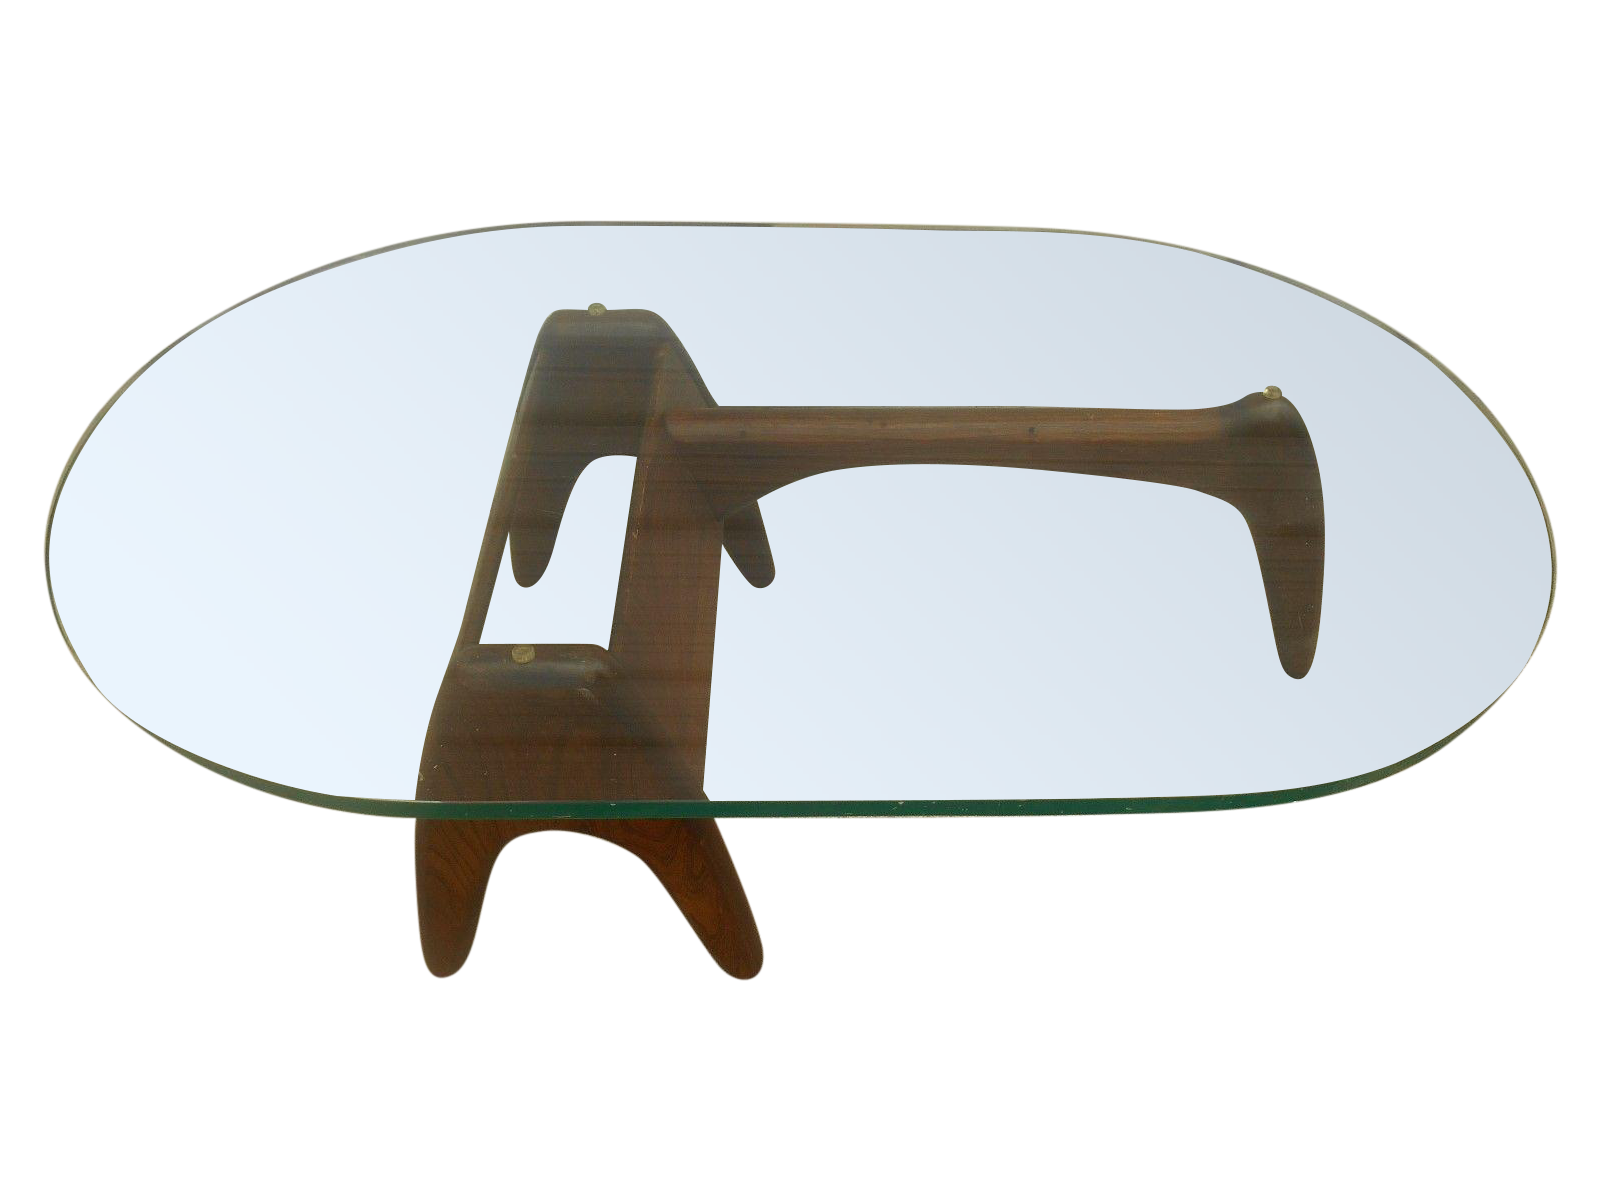 Midcentury Danish Mod Adrian Pearsall Coffee Table Chairish